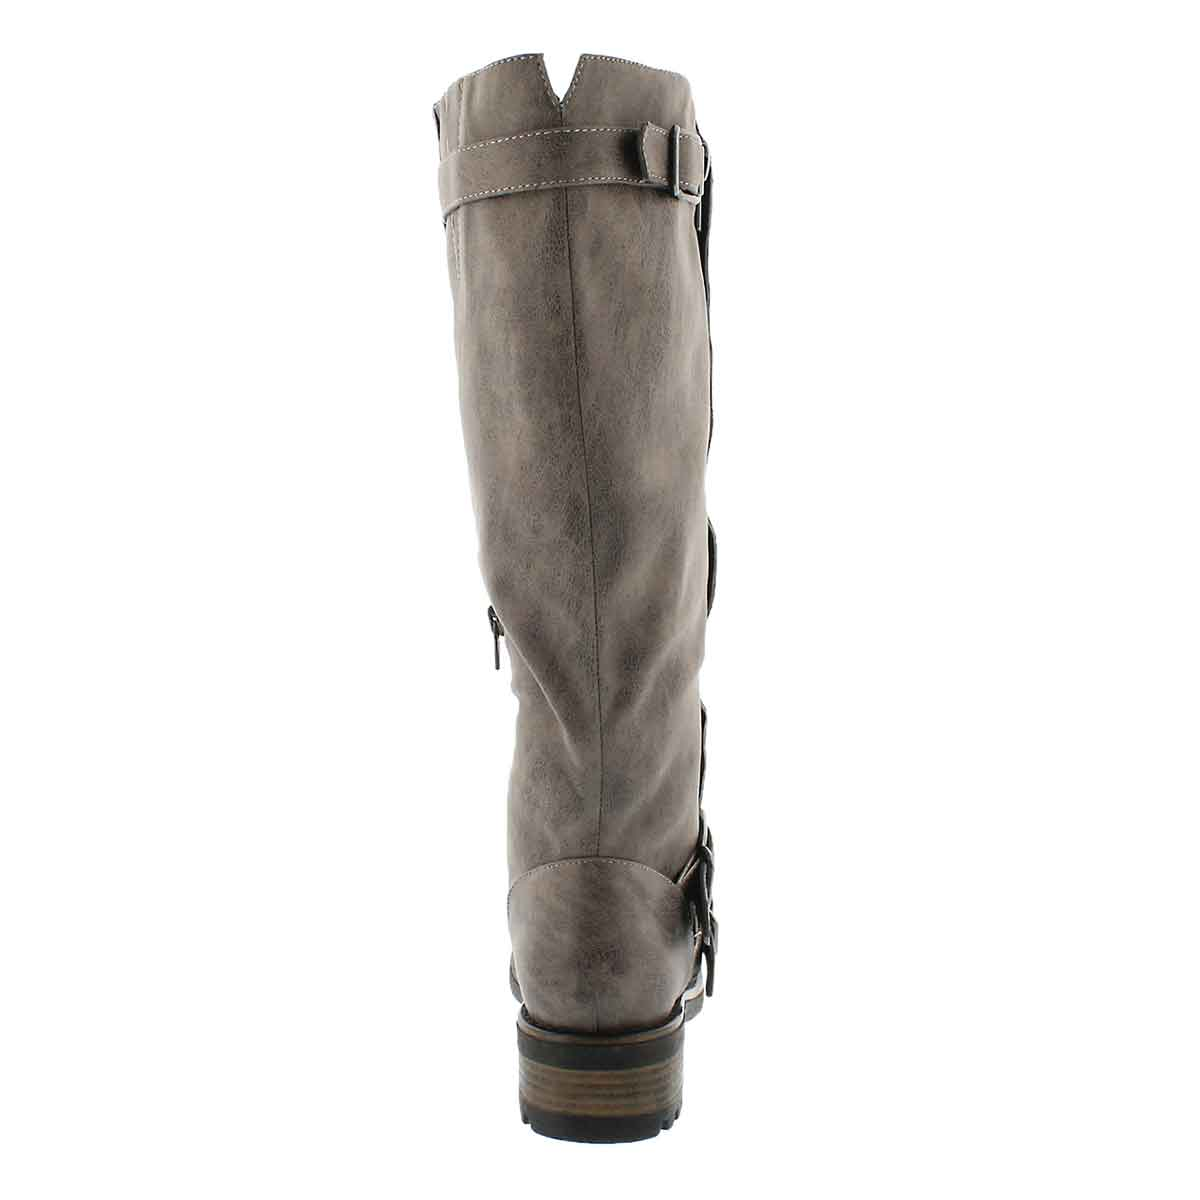 fe6e6f15df4 Women | Casual Boots | SoftMoc.com bard